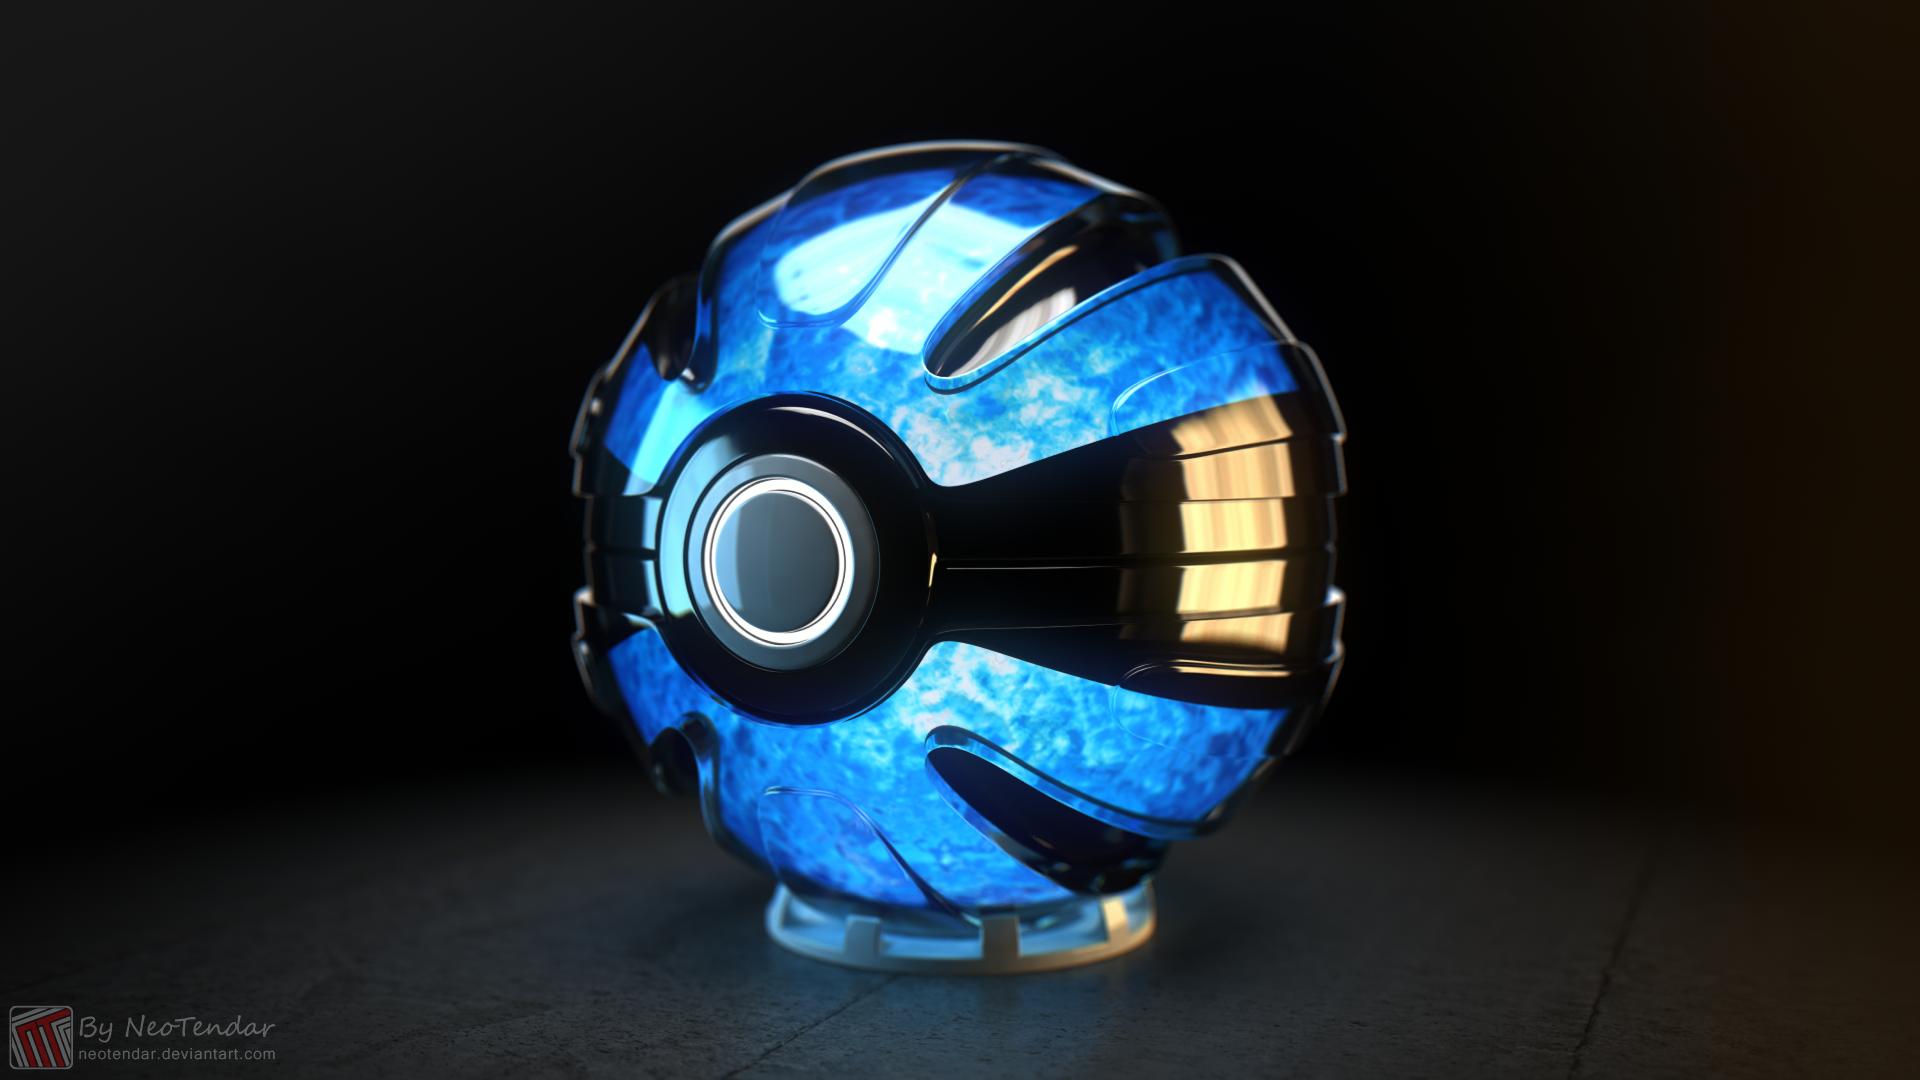 PKMN Unlimited - DiveBall 2.0